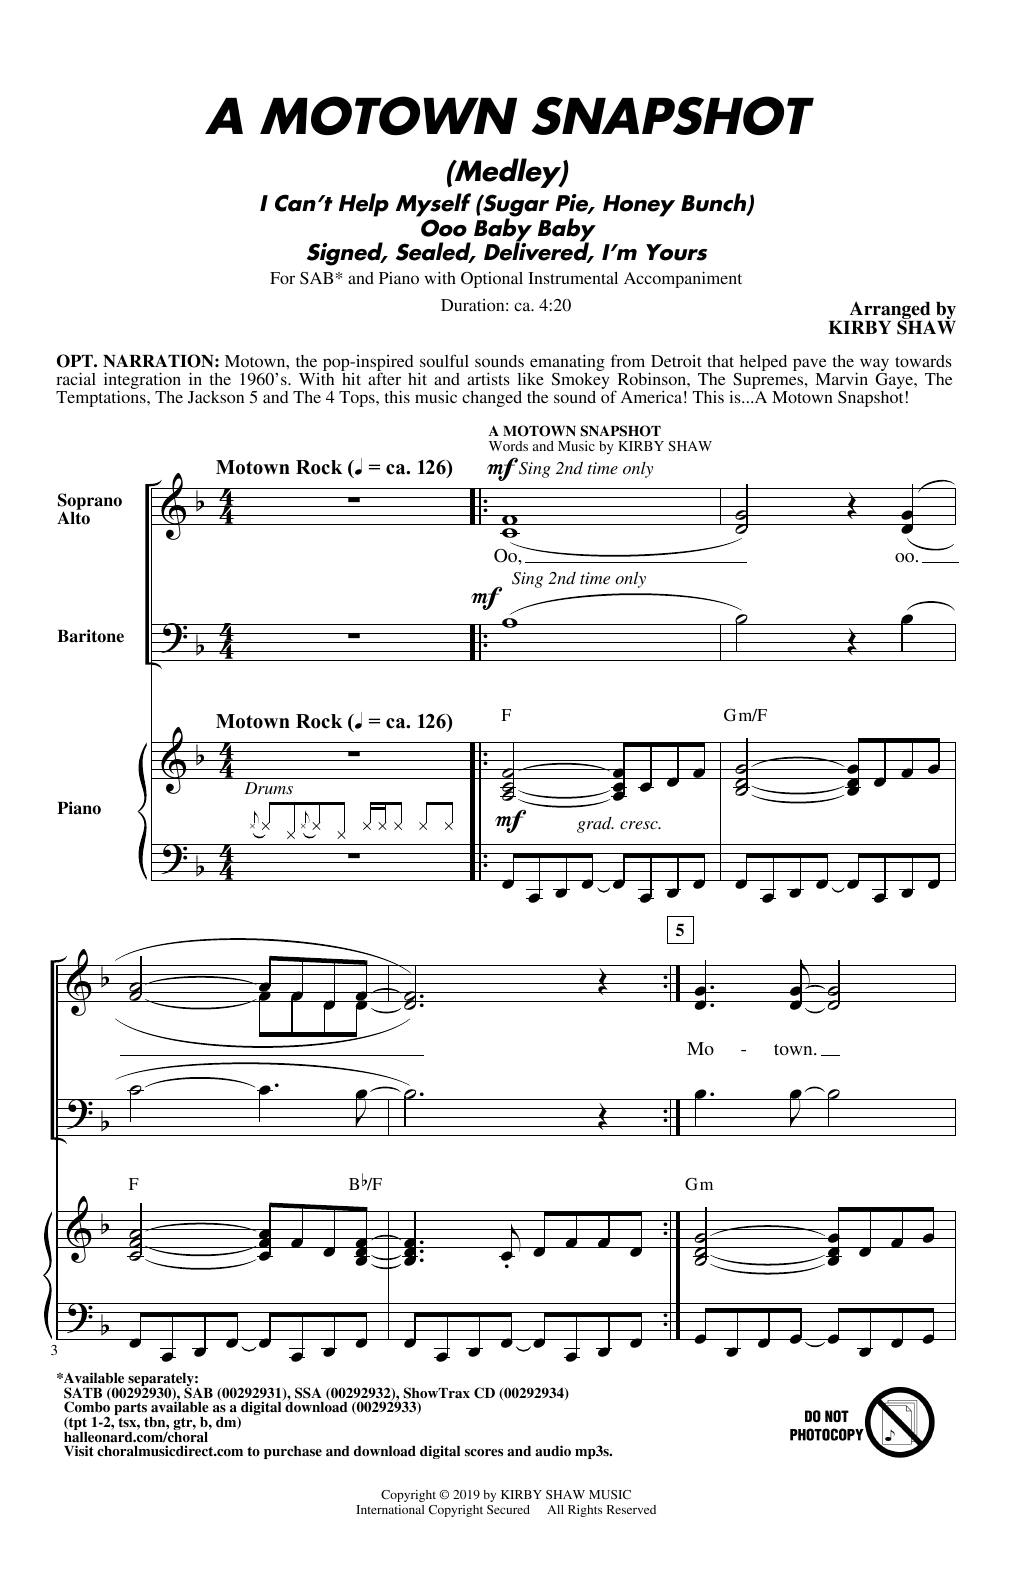 Kirby Shaw A Motown Snapshot (Medley) sheet music notes and chords. Download Printable PDF.